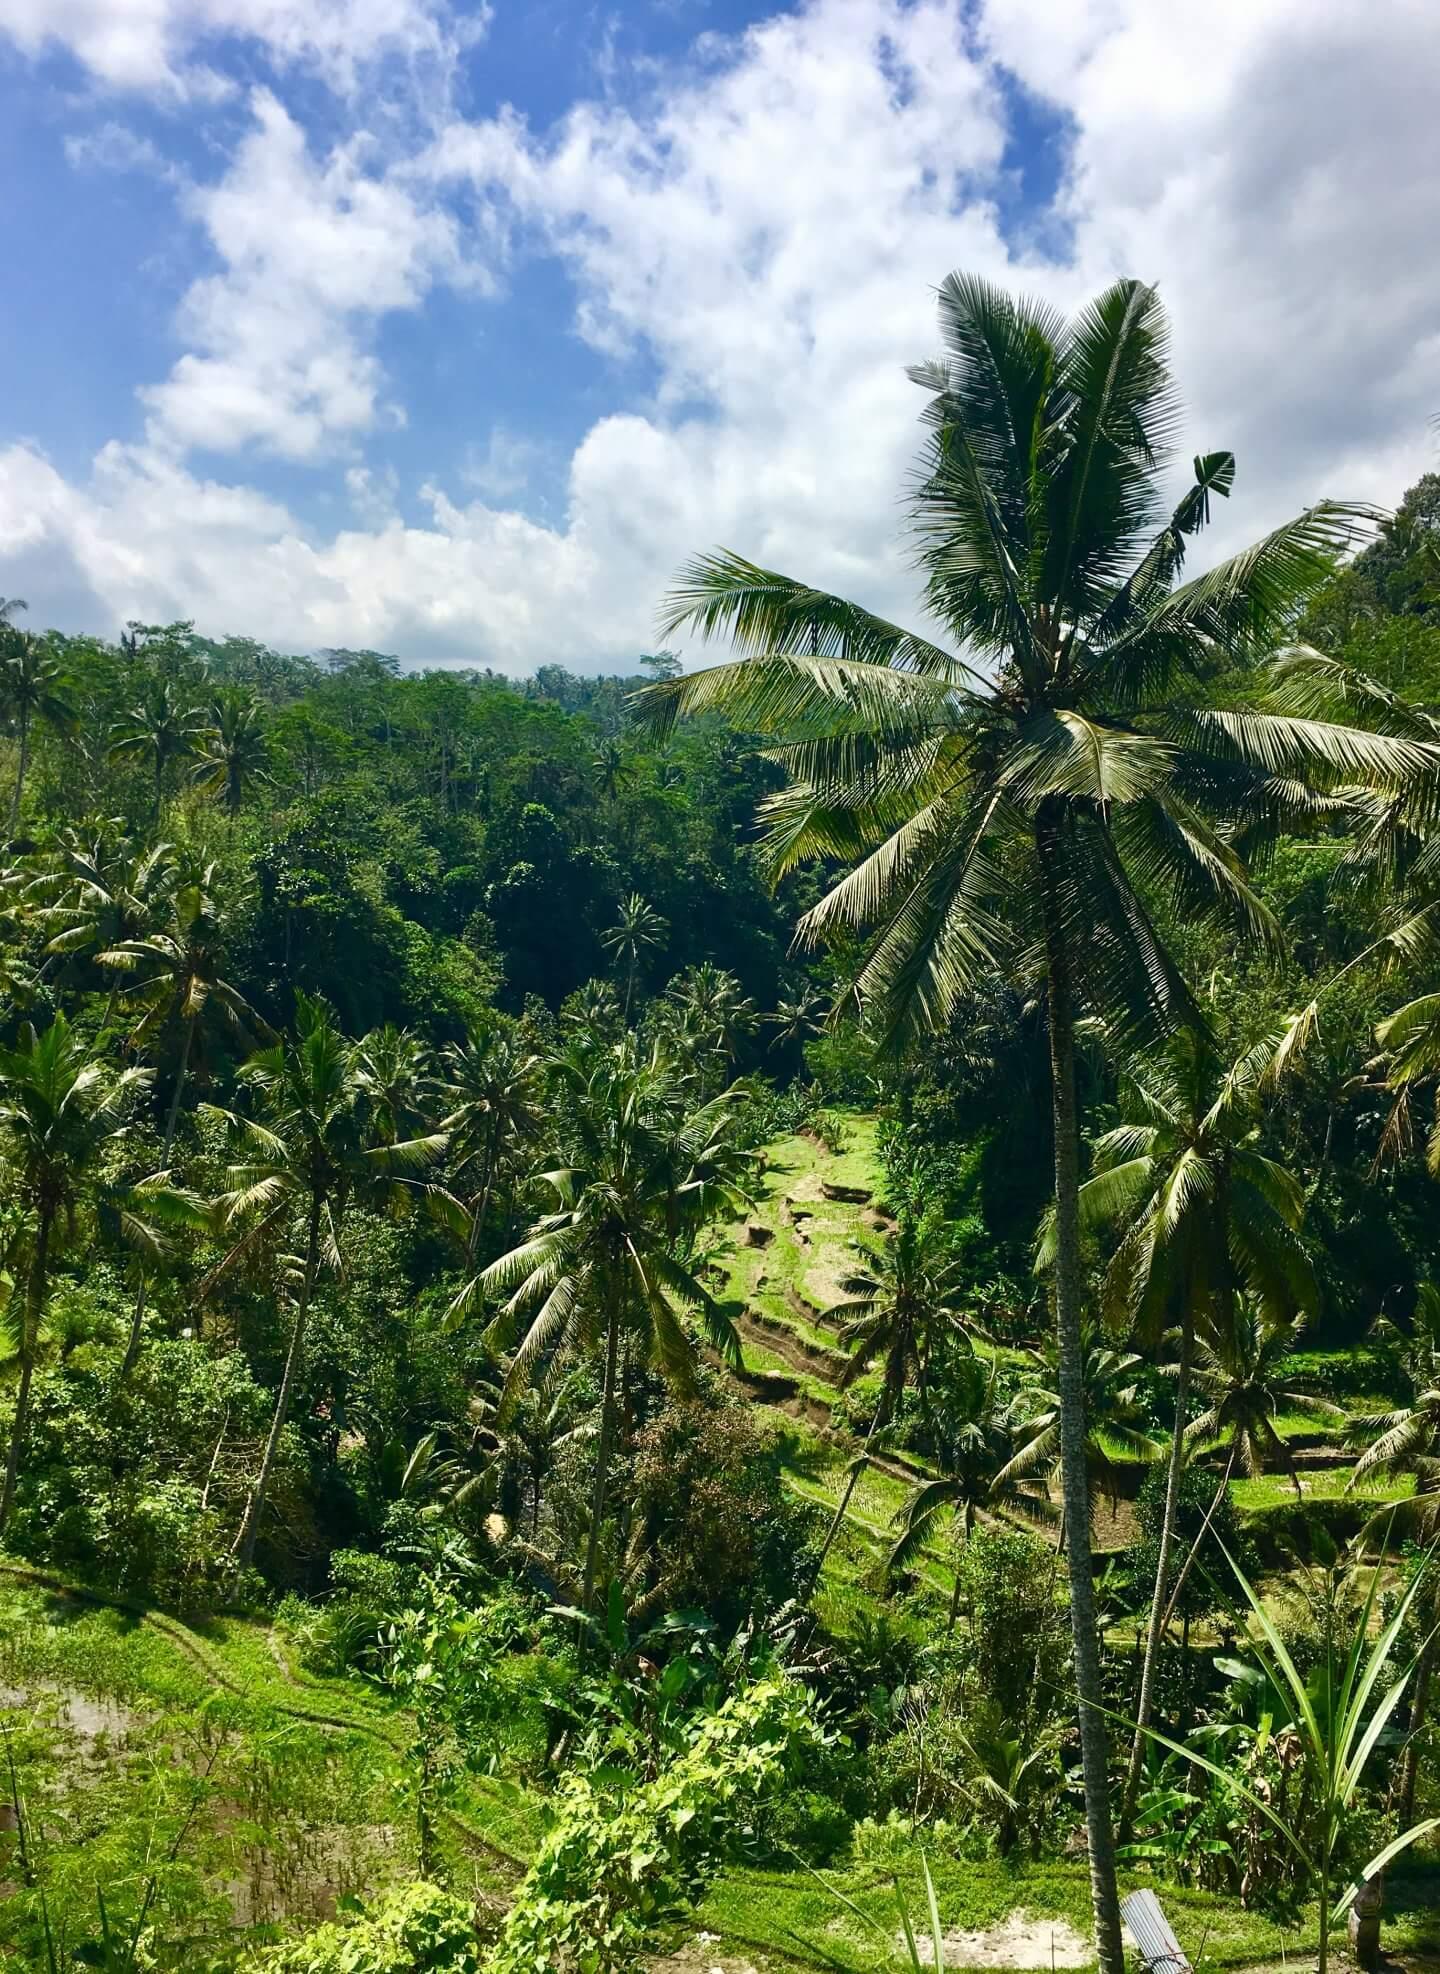 Bali Indonesien Reisen Ruhe Erholung Brexit Sturm IKNMLO